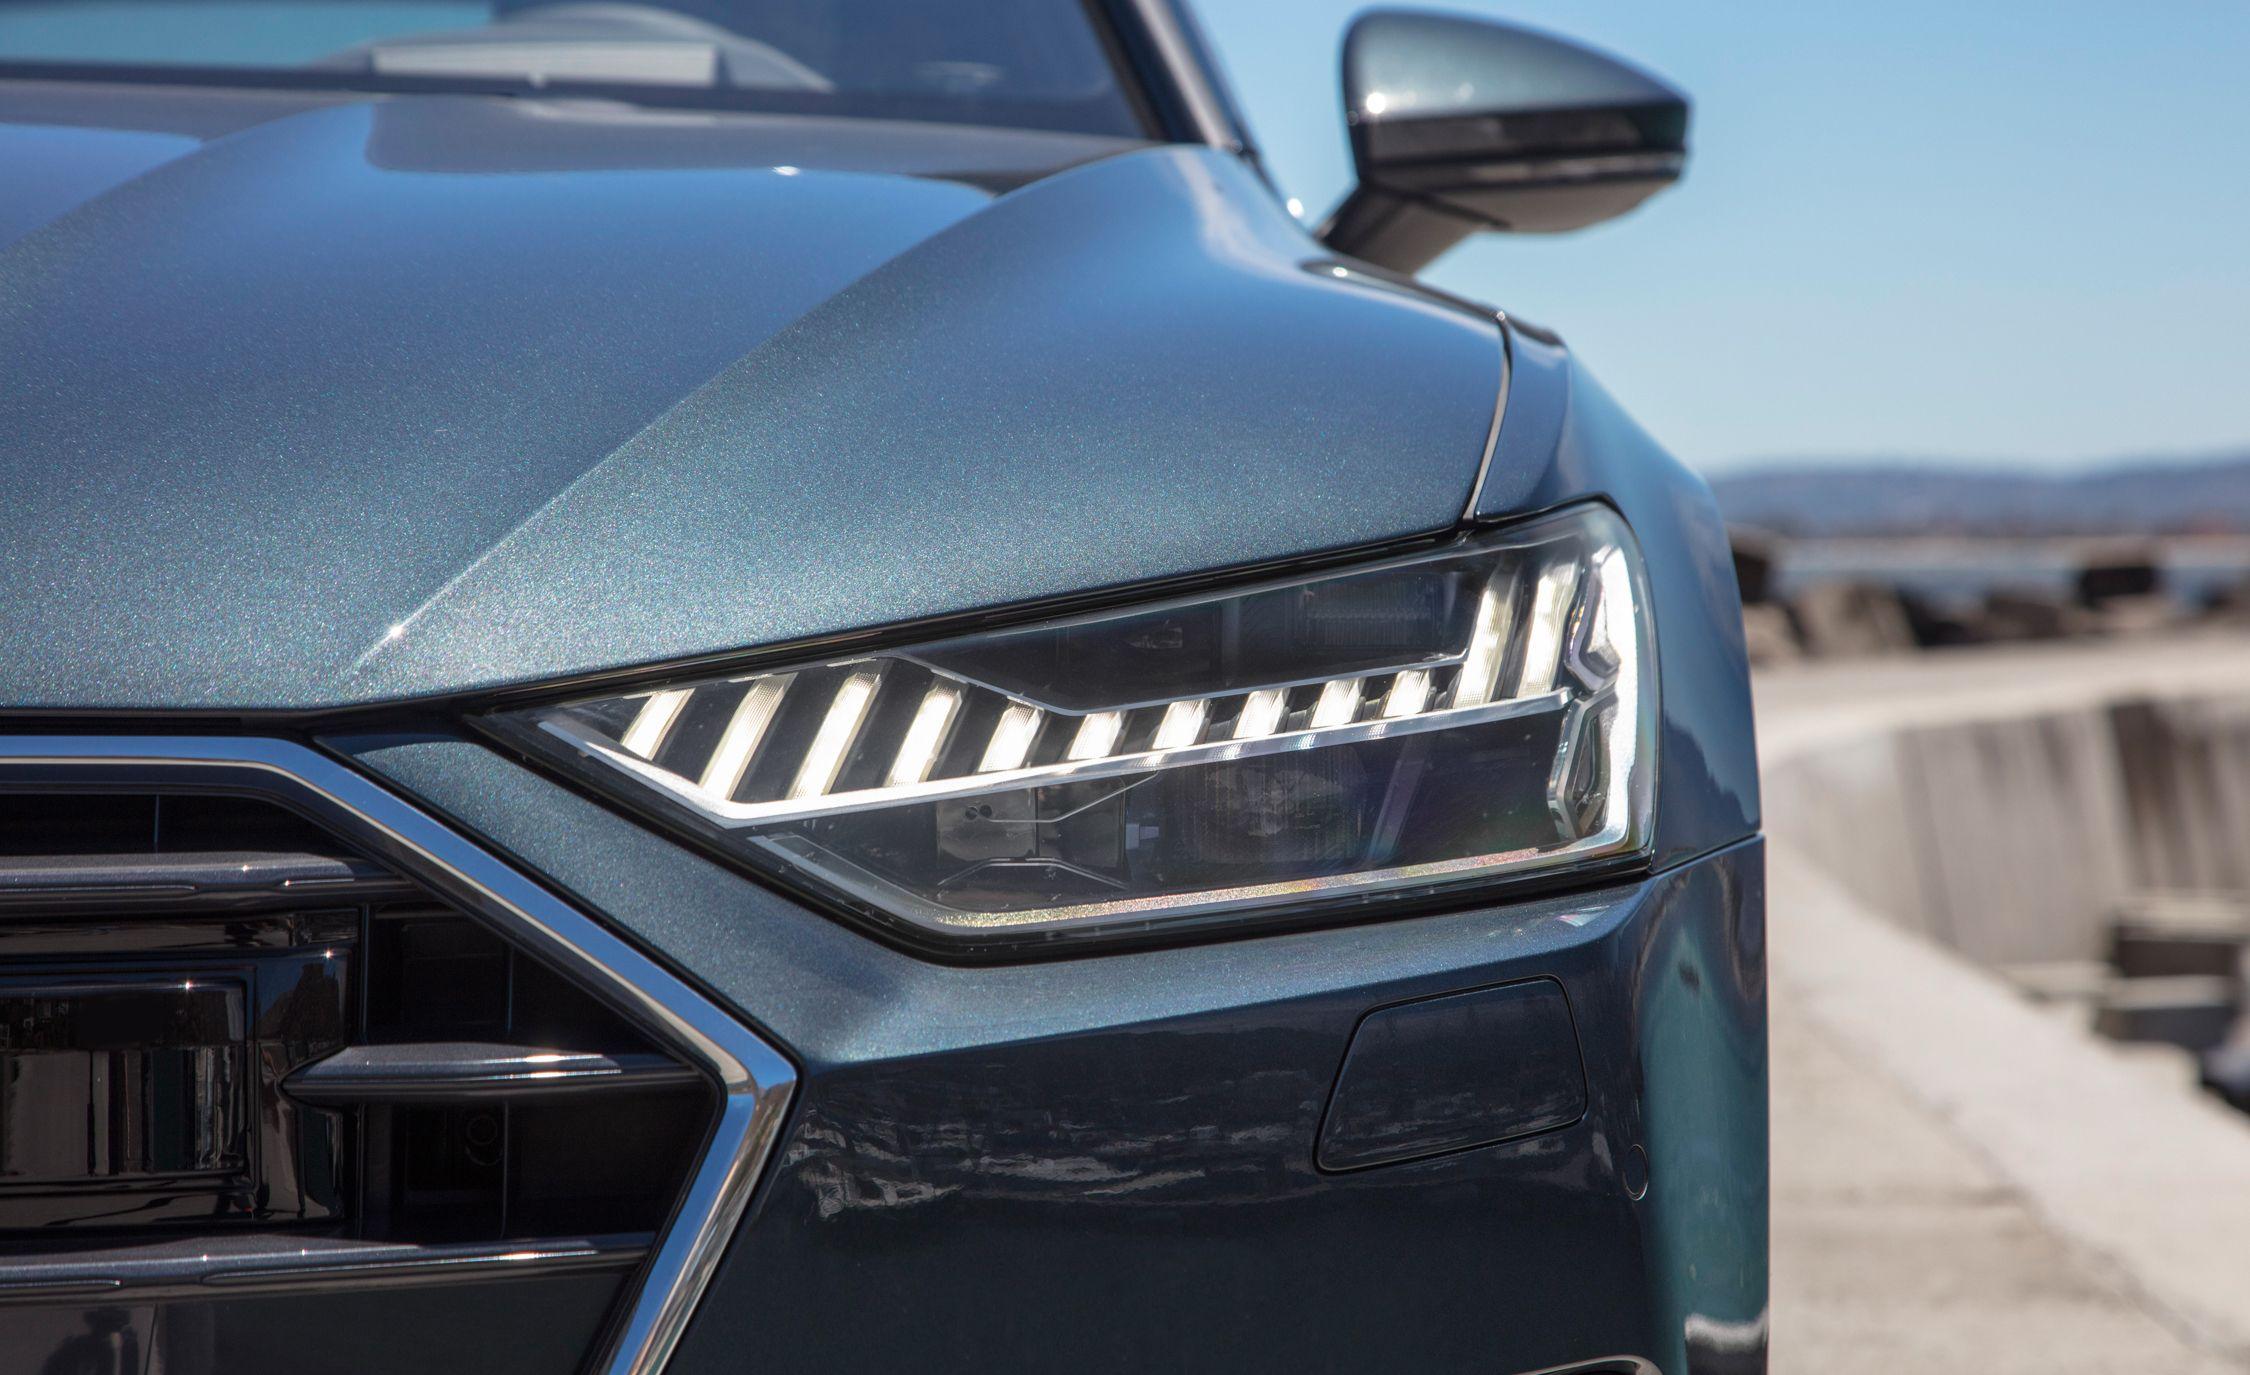 2019-Audi-A7-Sportback-179-1.jpg